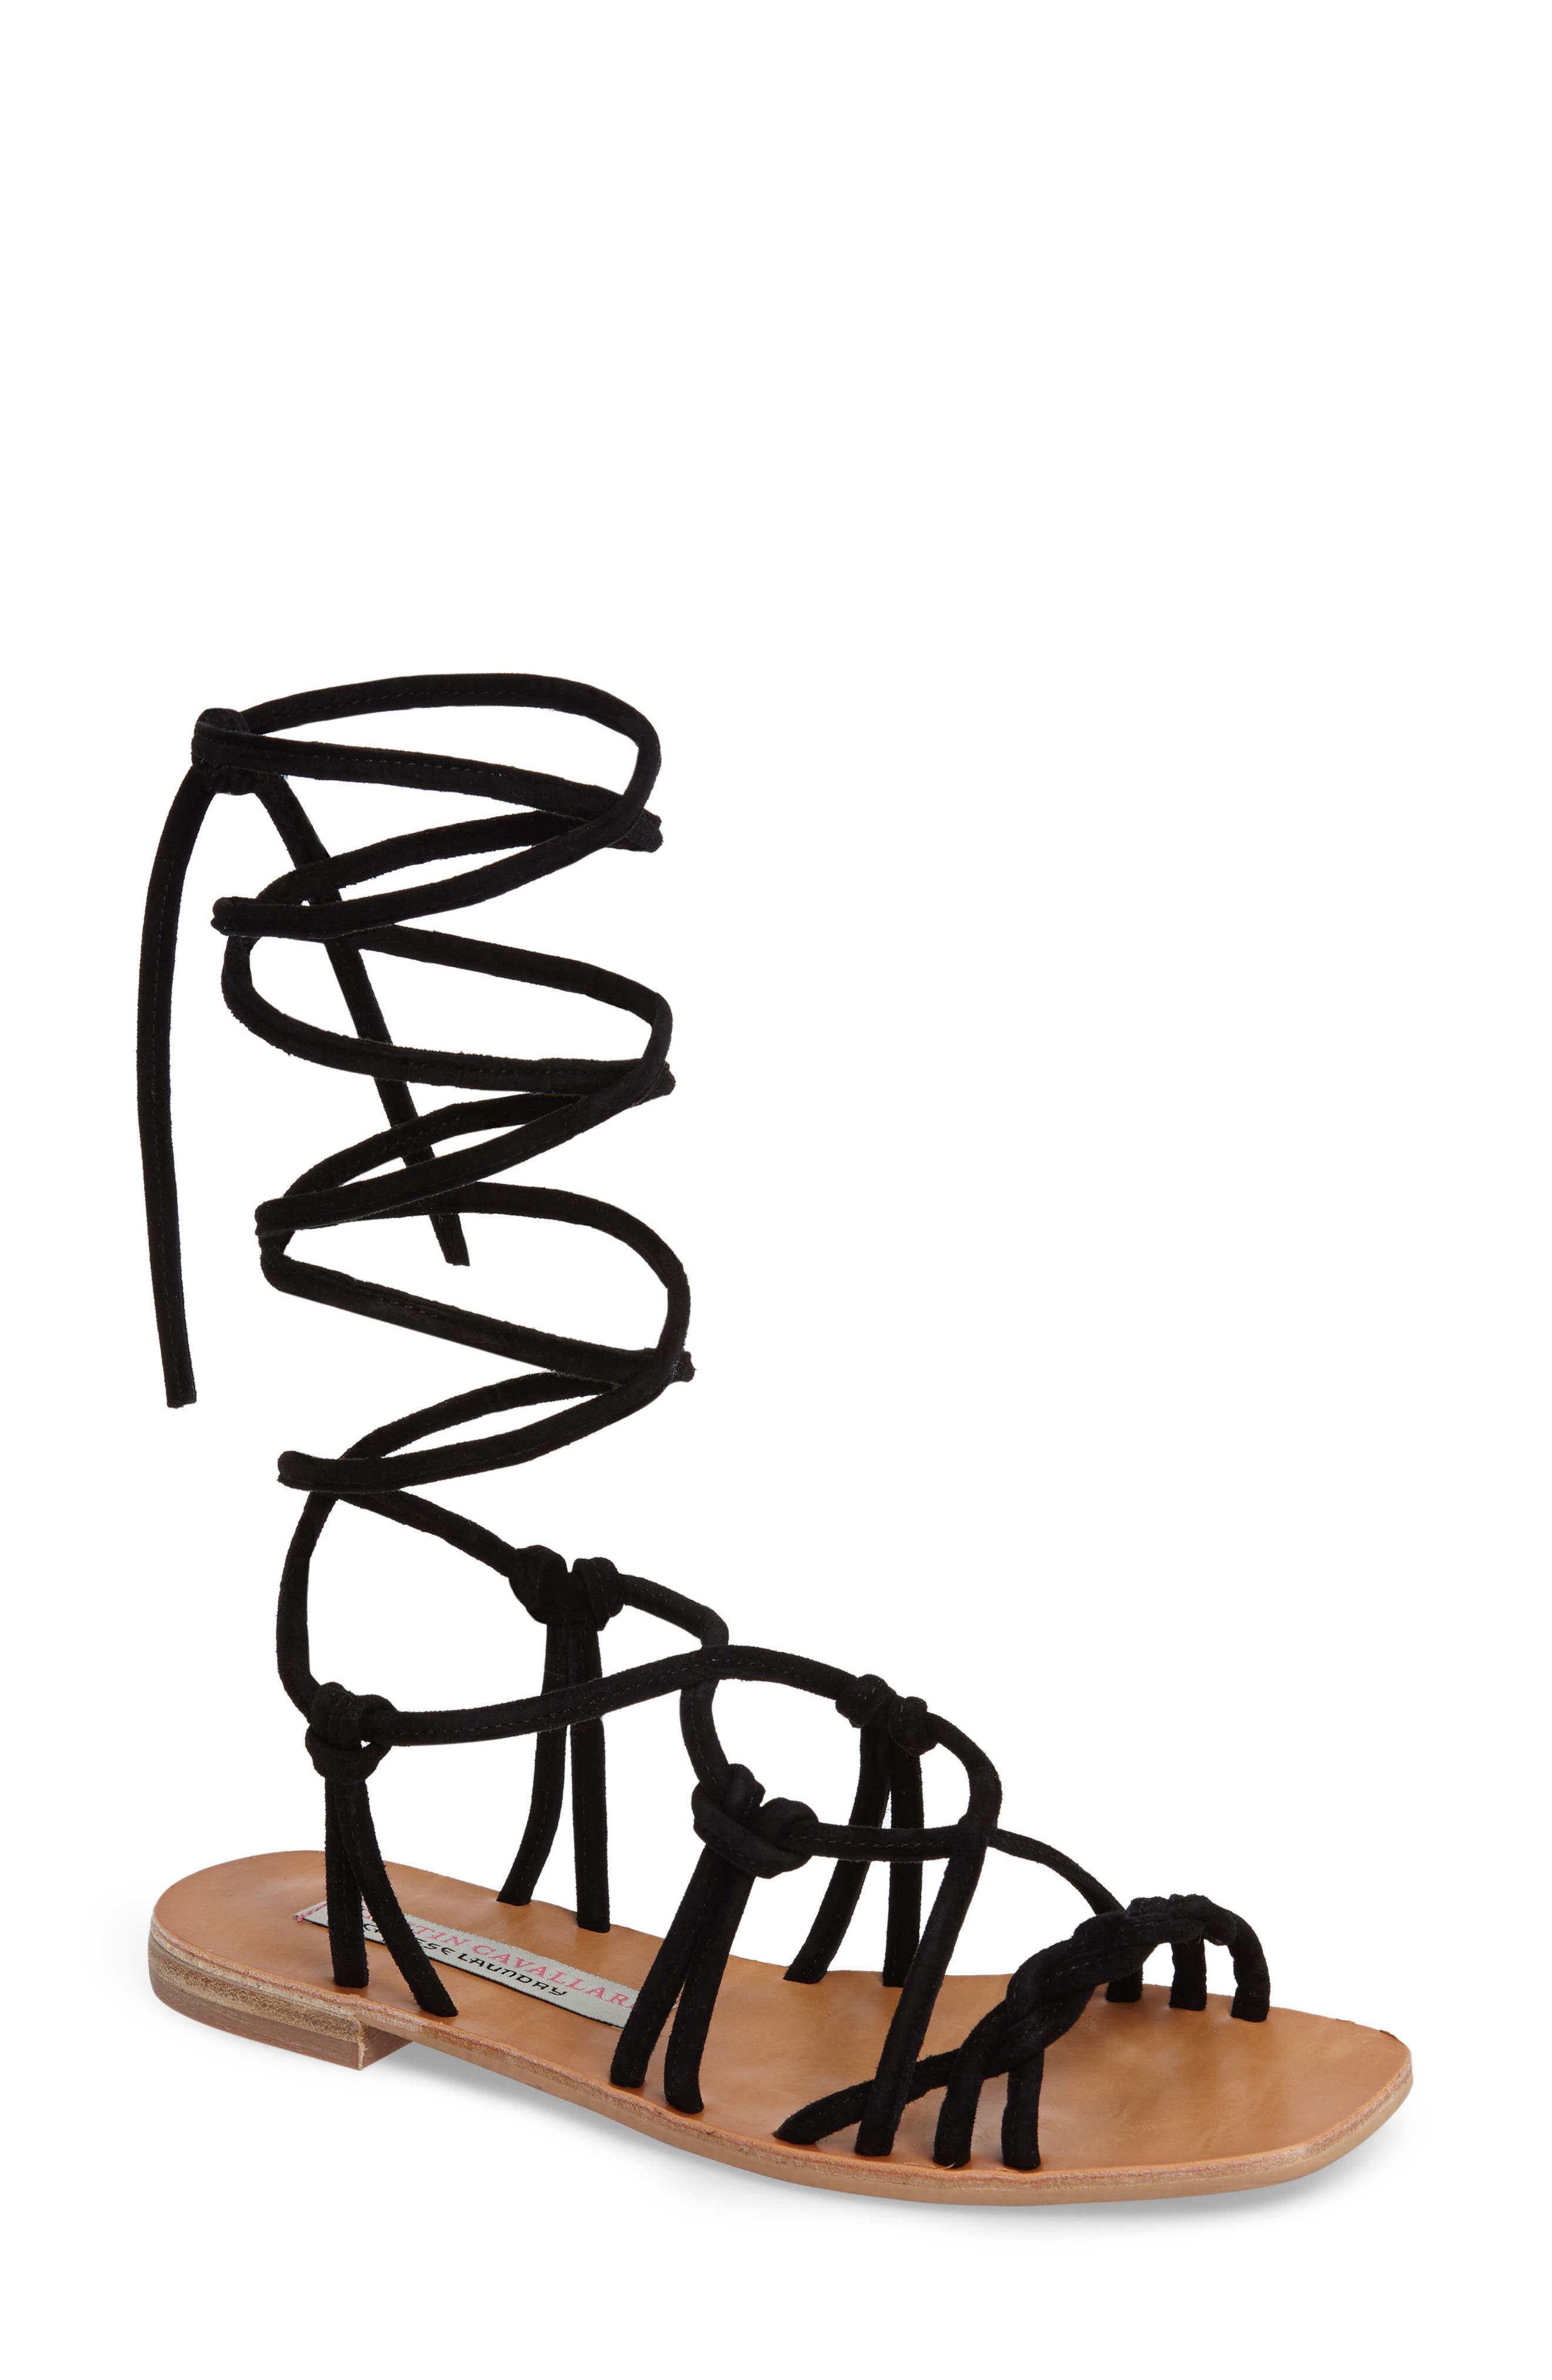 Alternate Image 1 Selected - Kristin Cavallari Tori Knotted Wraparound Sandal (Women)